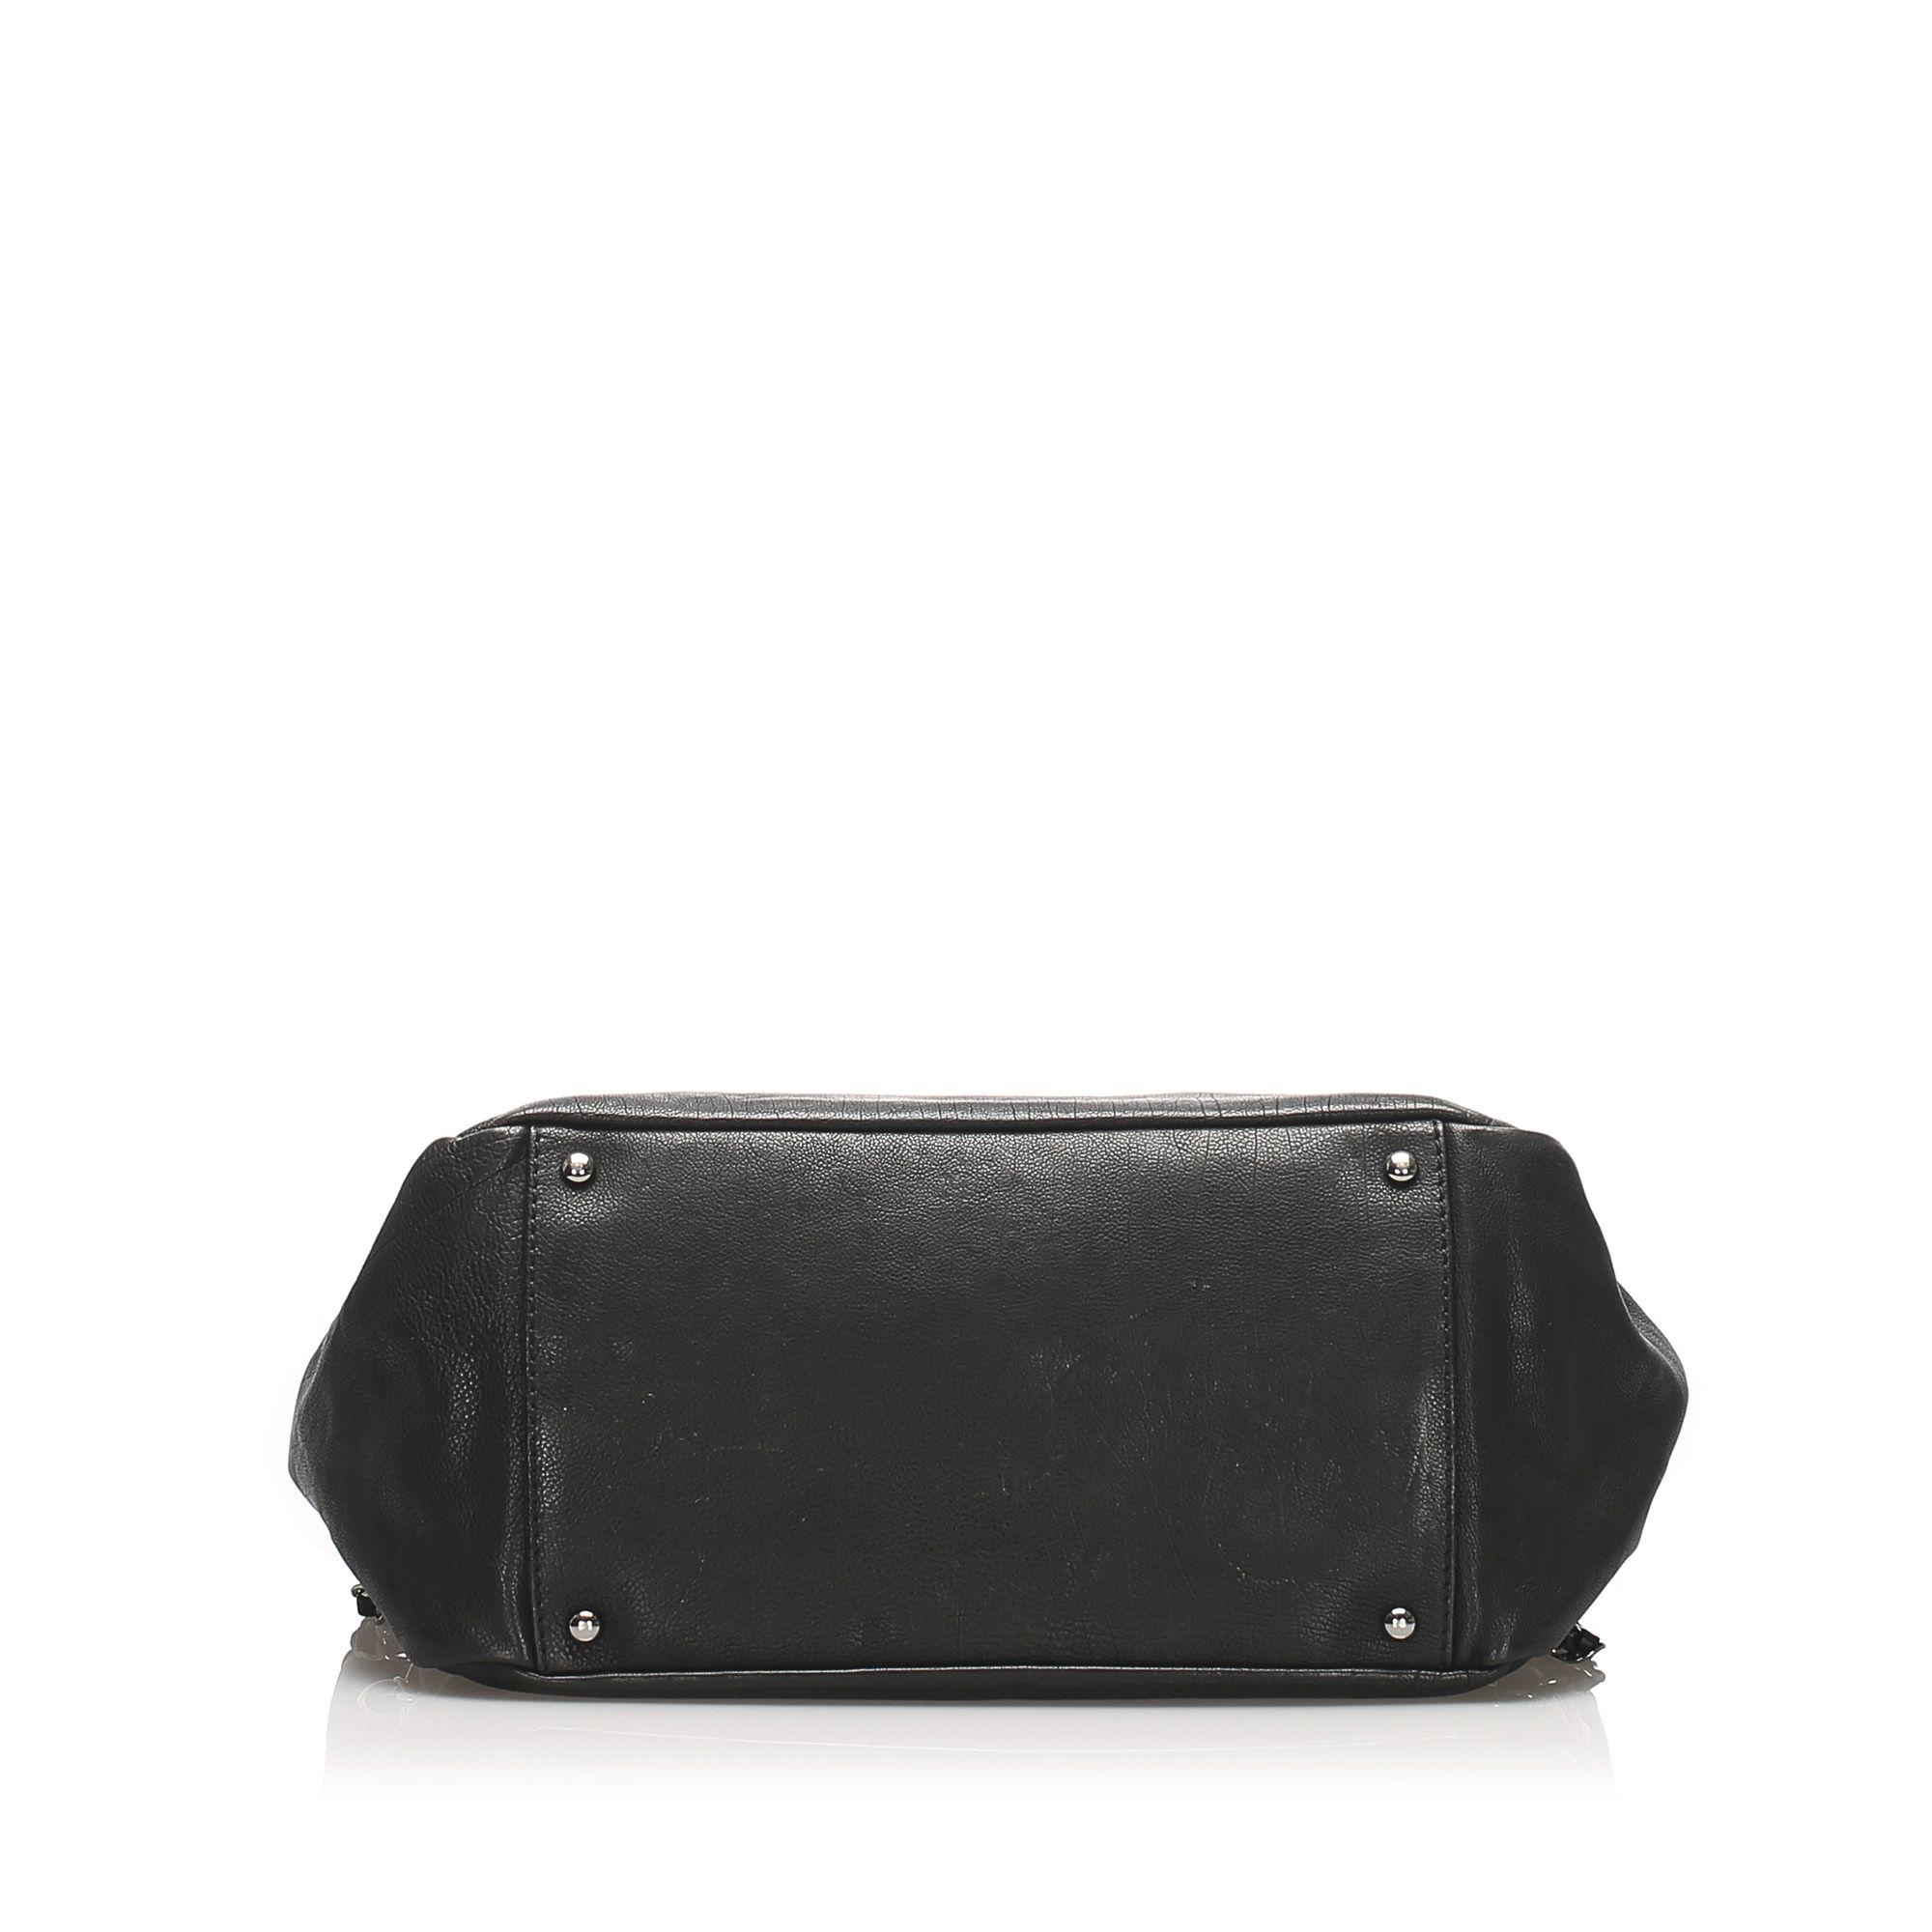 Vintage Chanel Accordion Leather Flap Bag Black